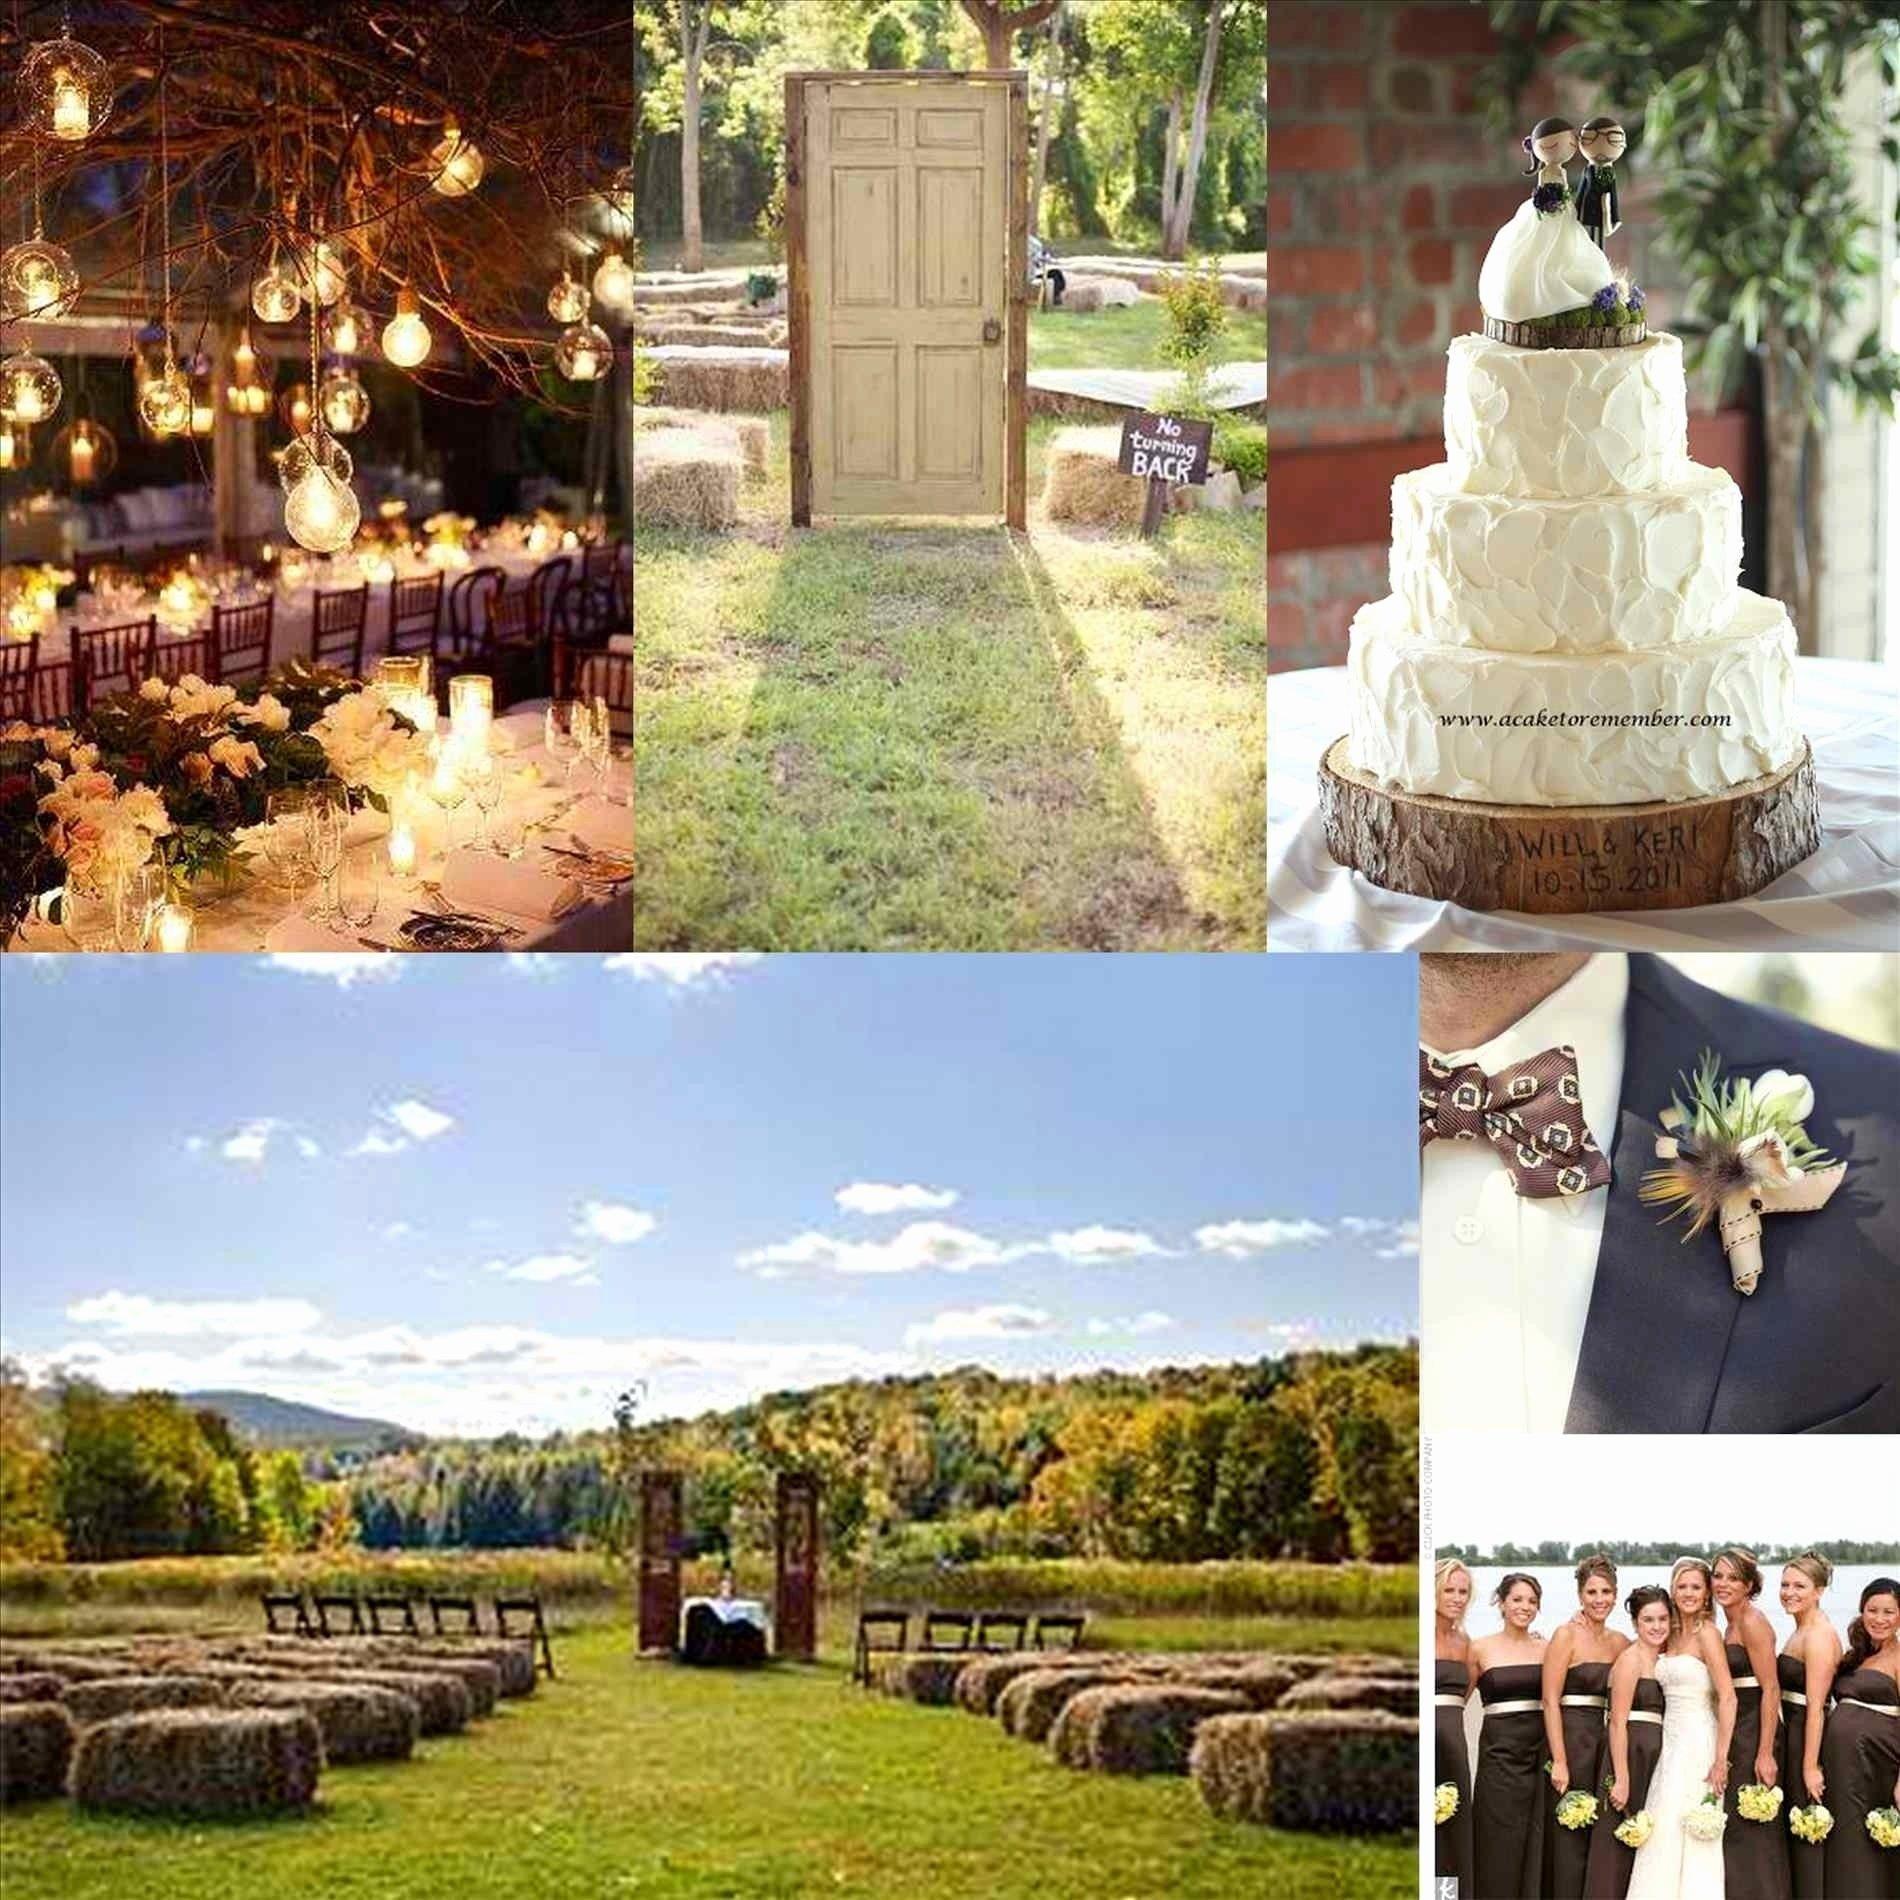 10 Stylish Outside Wedding Ideas For Summer 50 lovely diy garden wedding decorations wedding inspirations